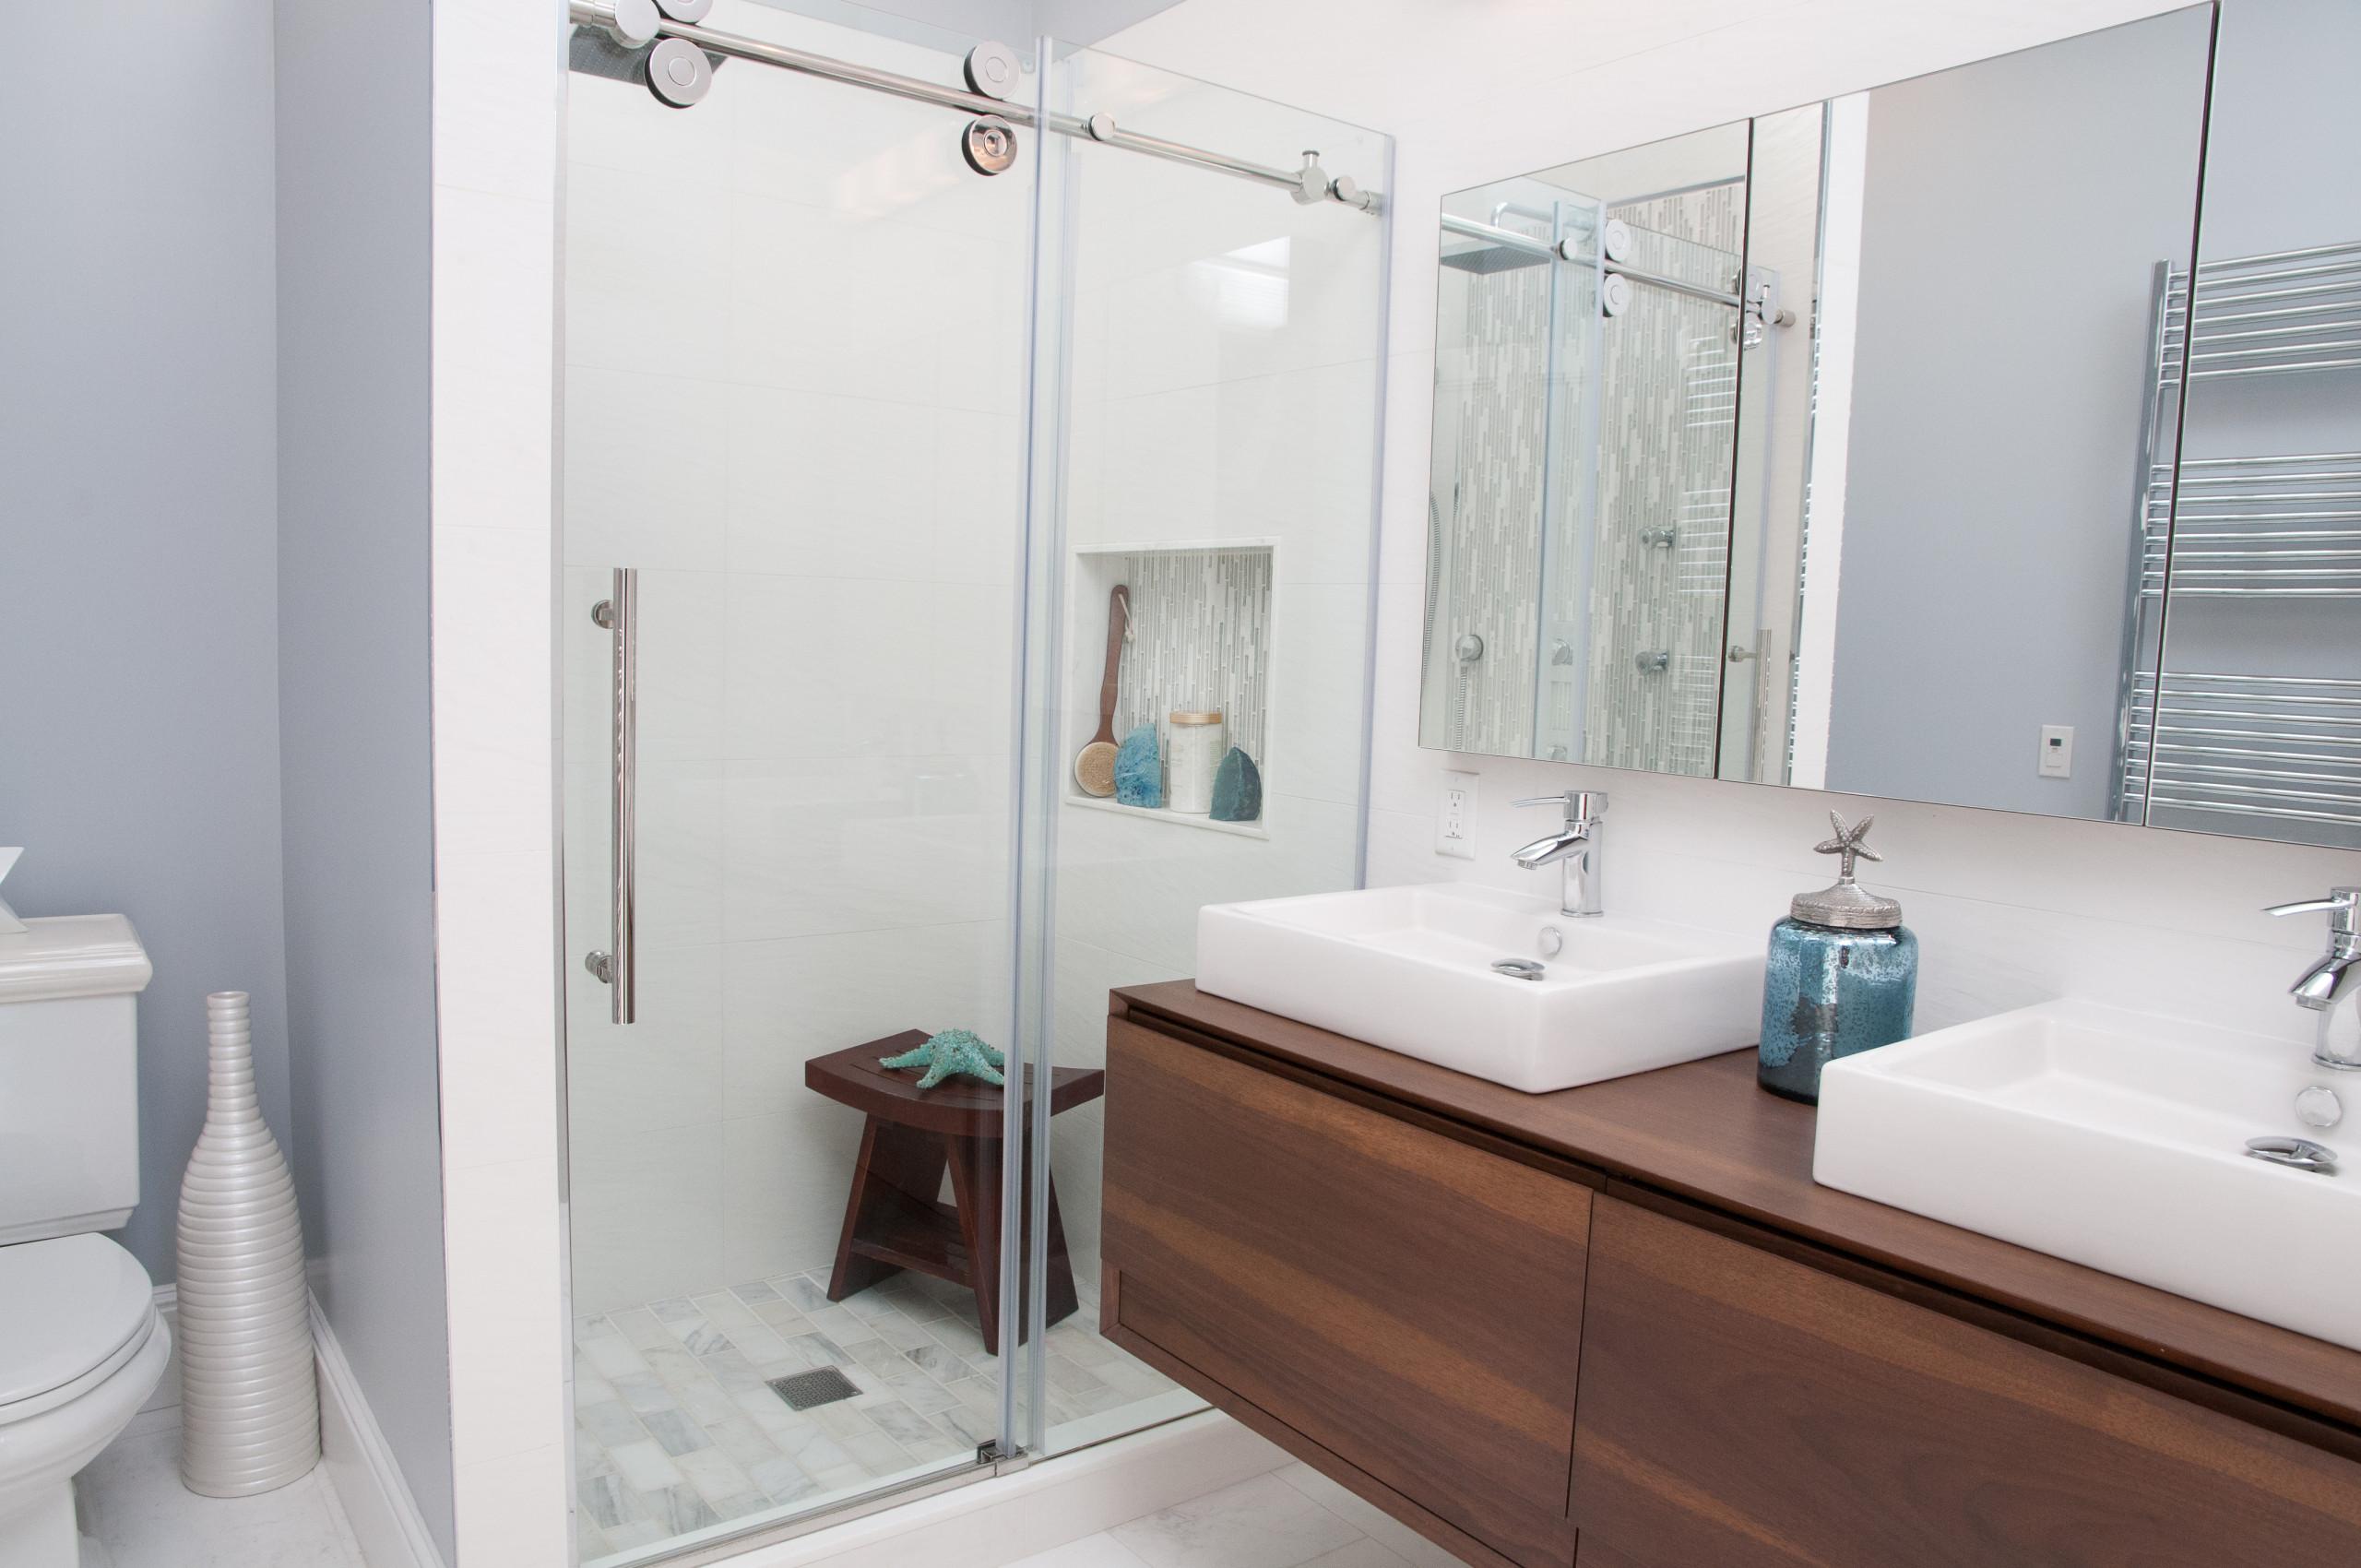 Bathroom Remodel - Hoboken 11th Street